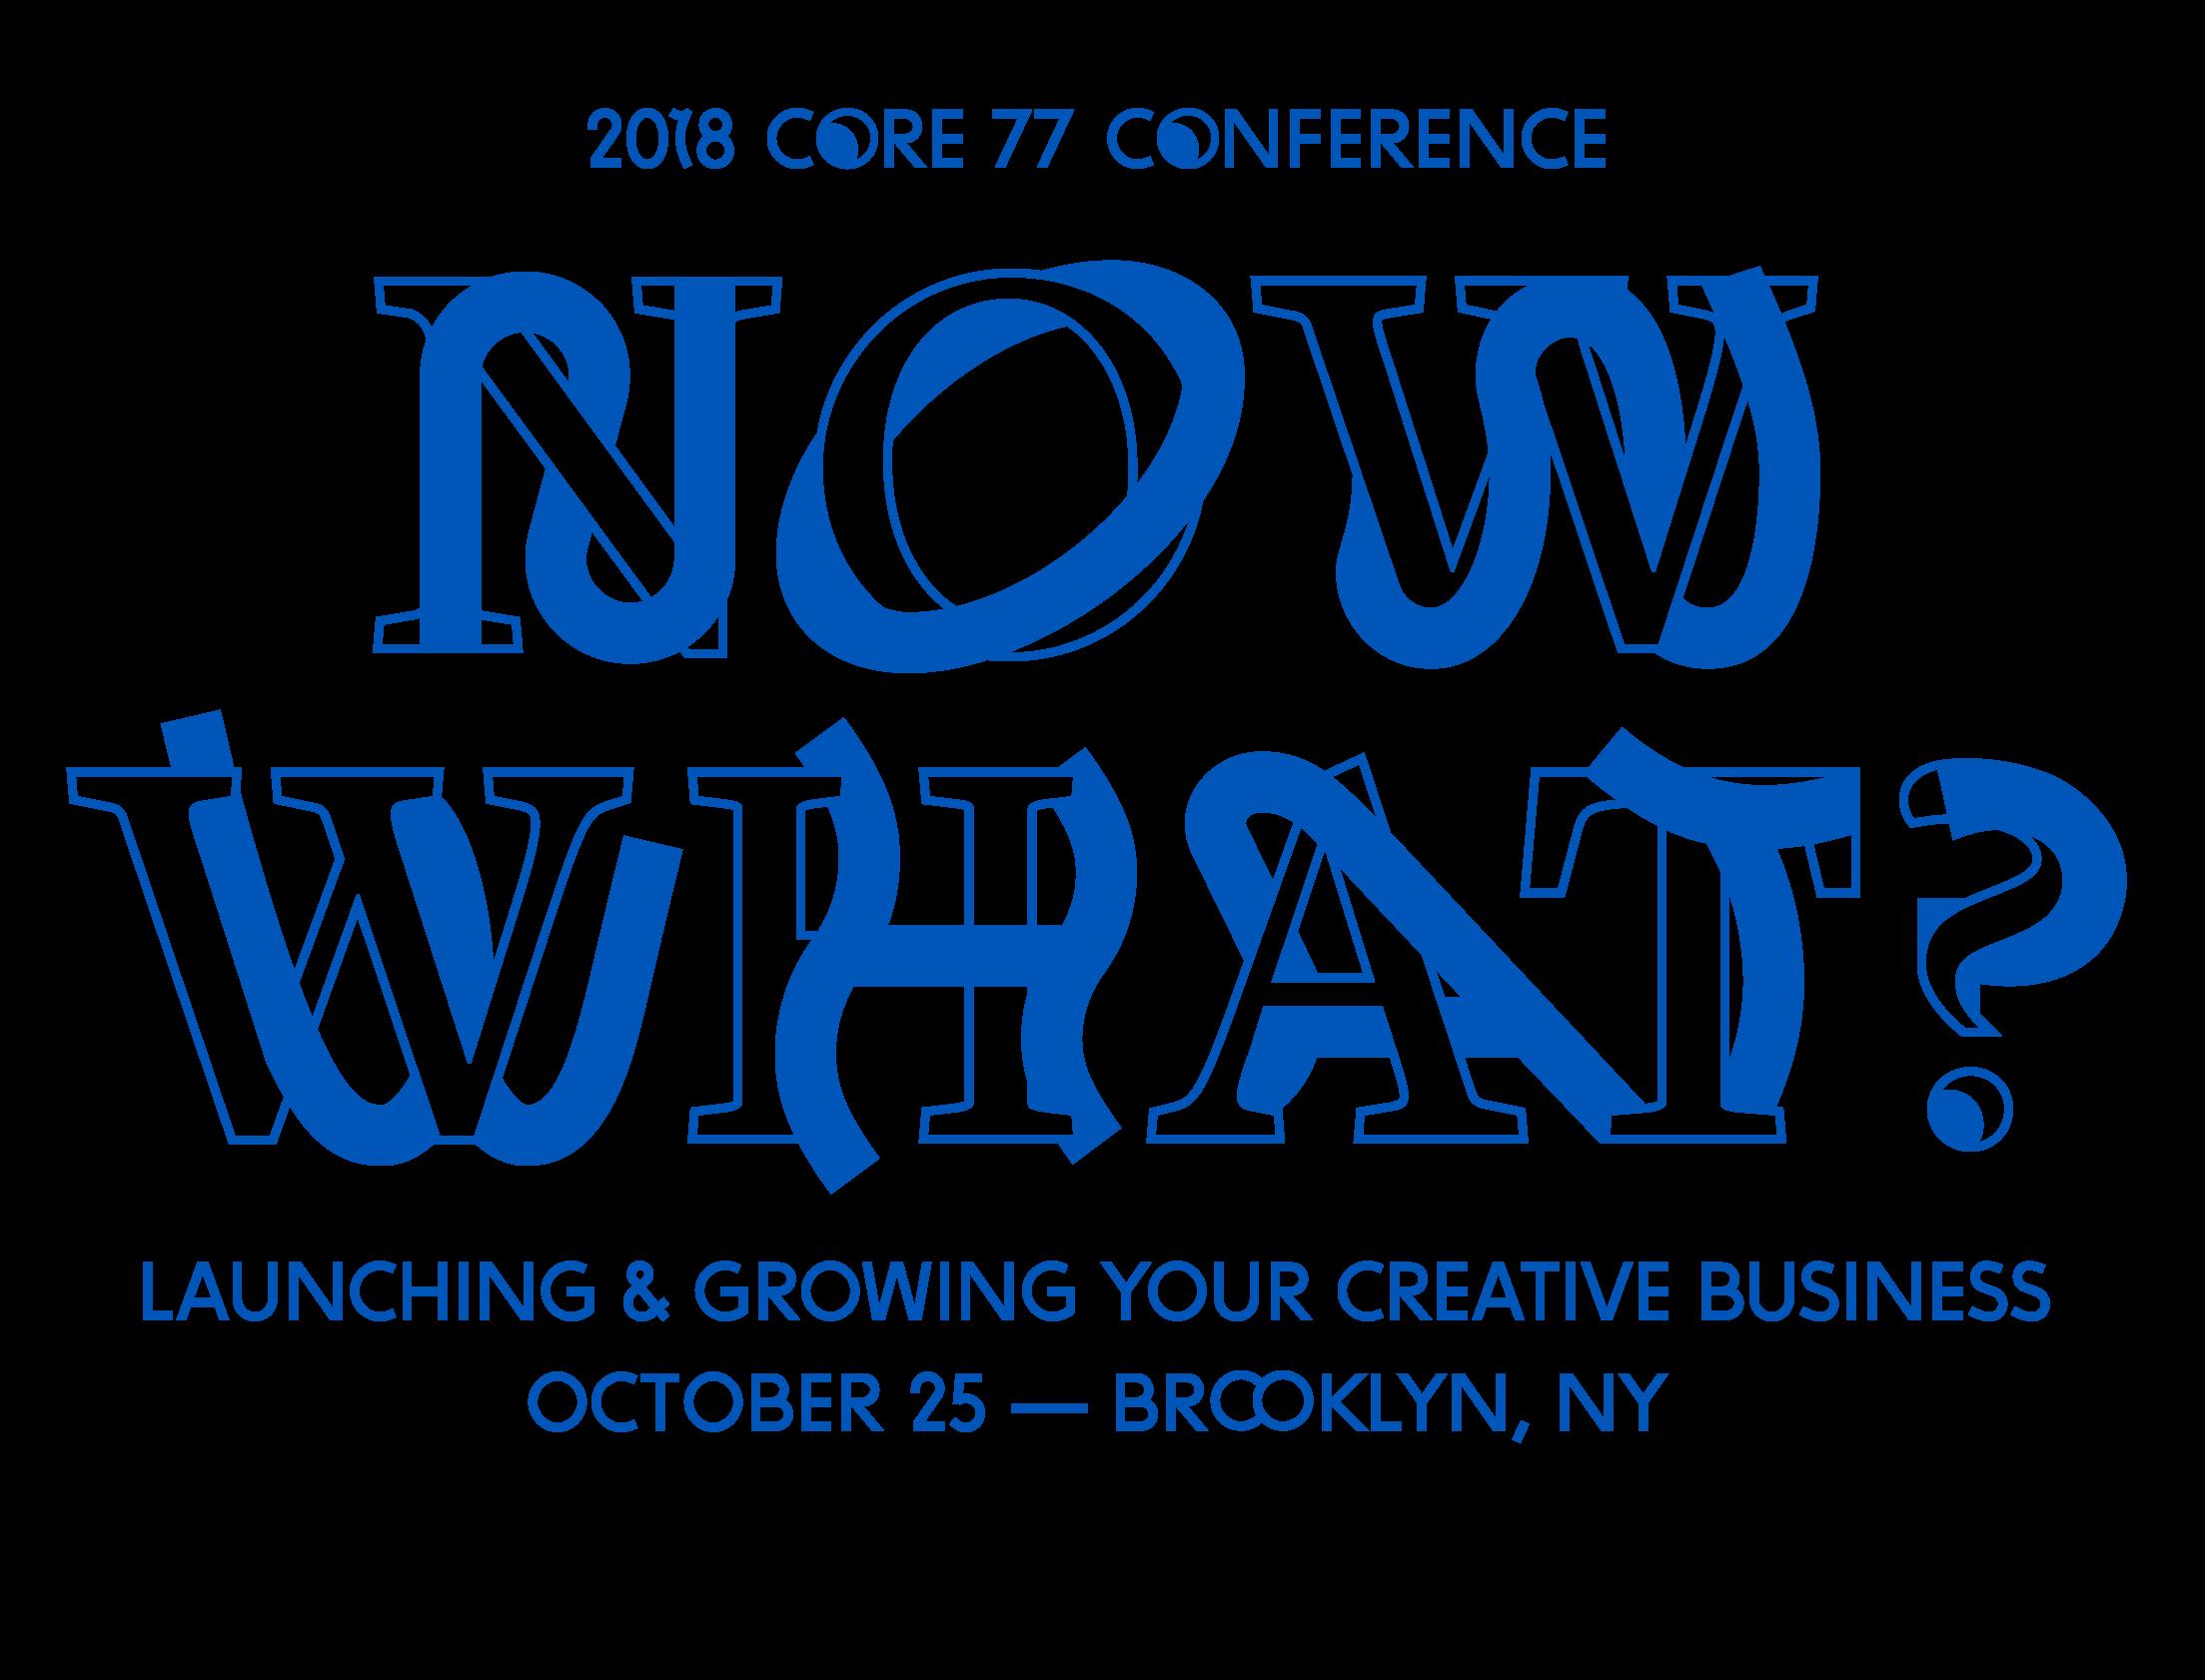 2018 Core77 Conference